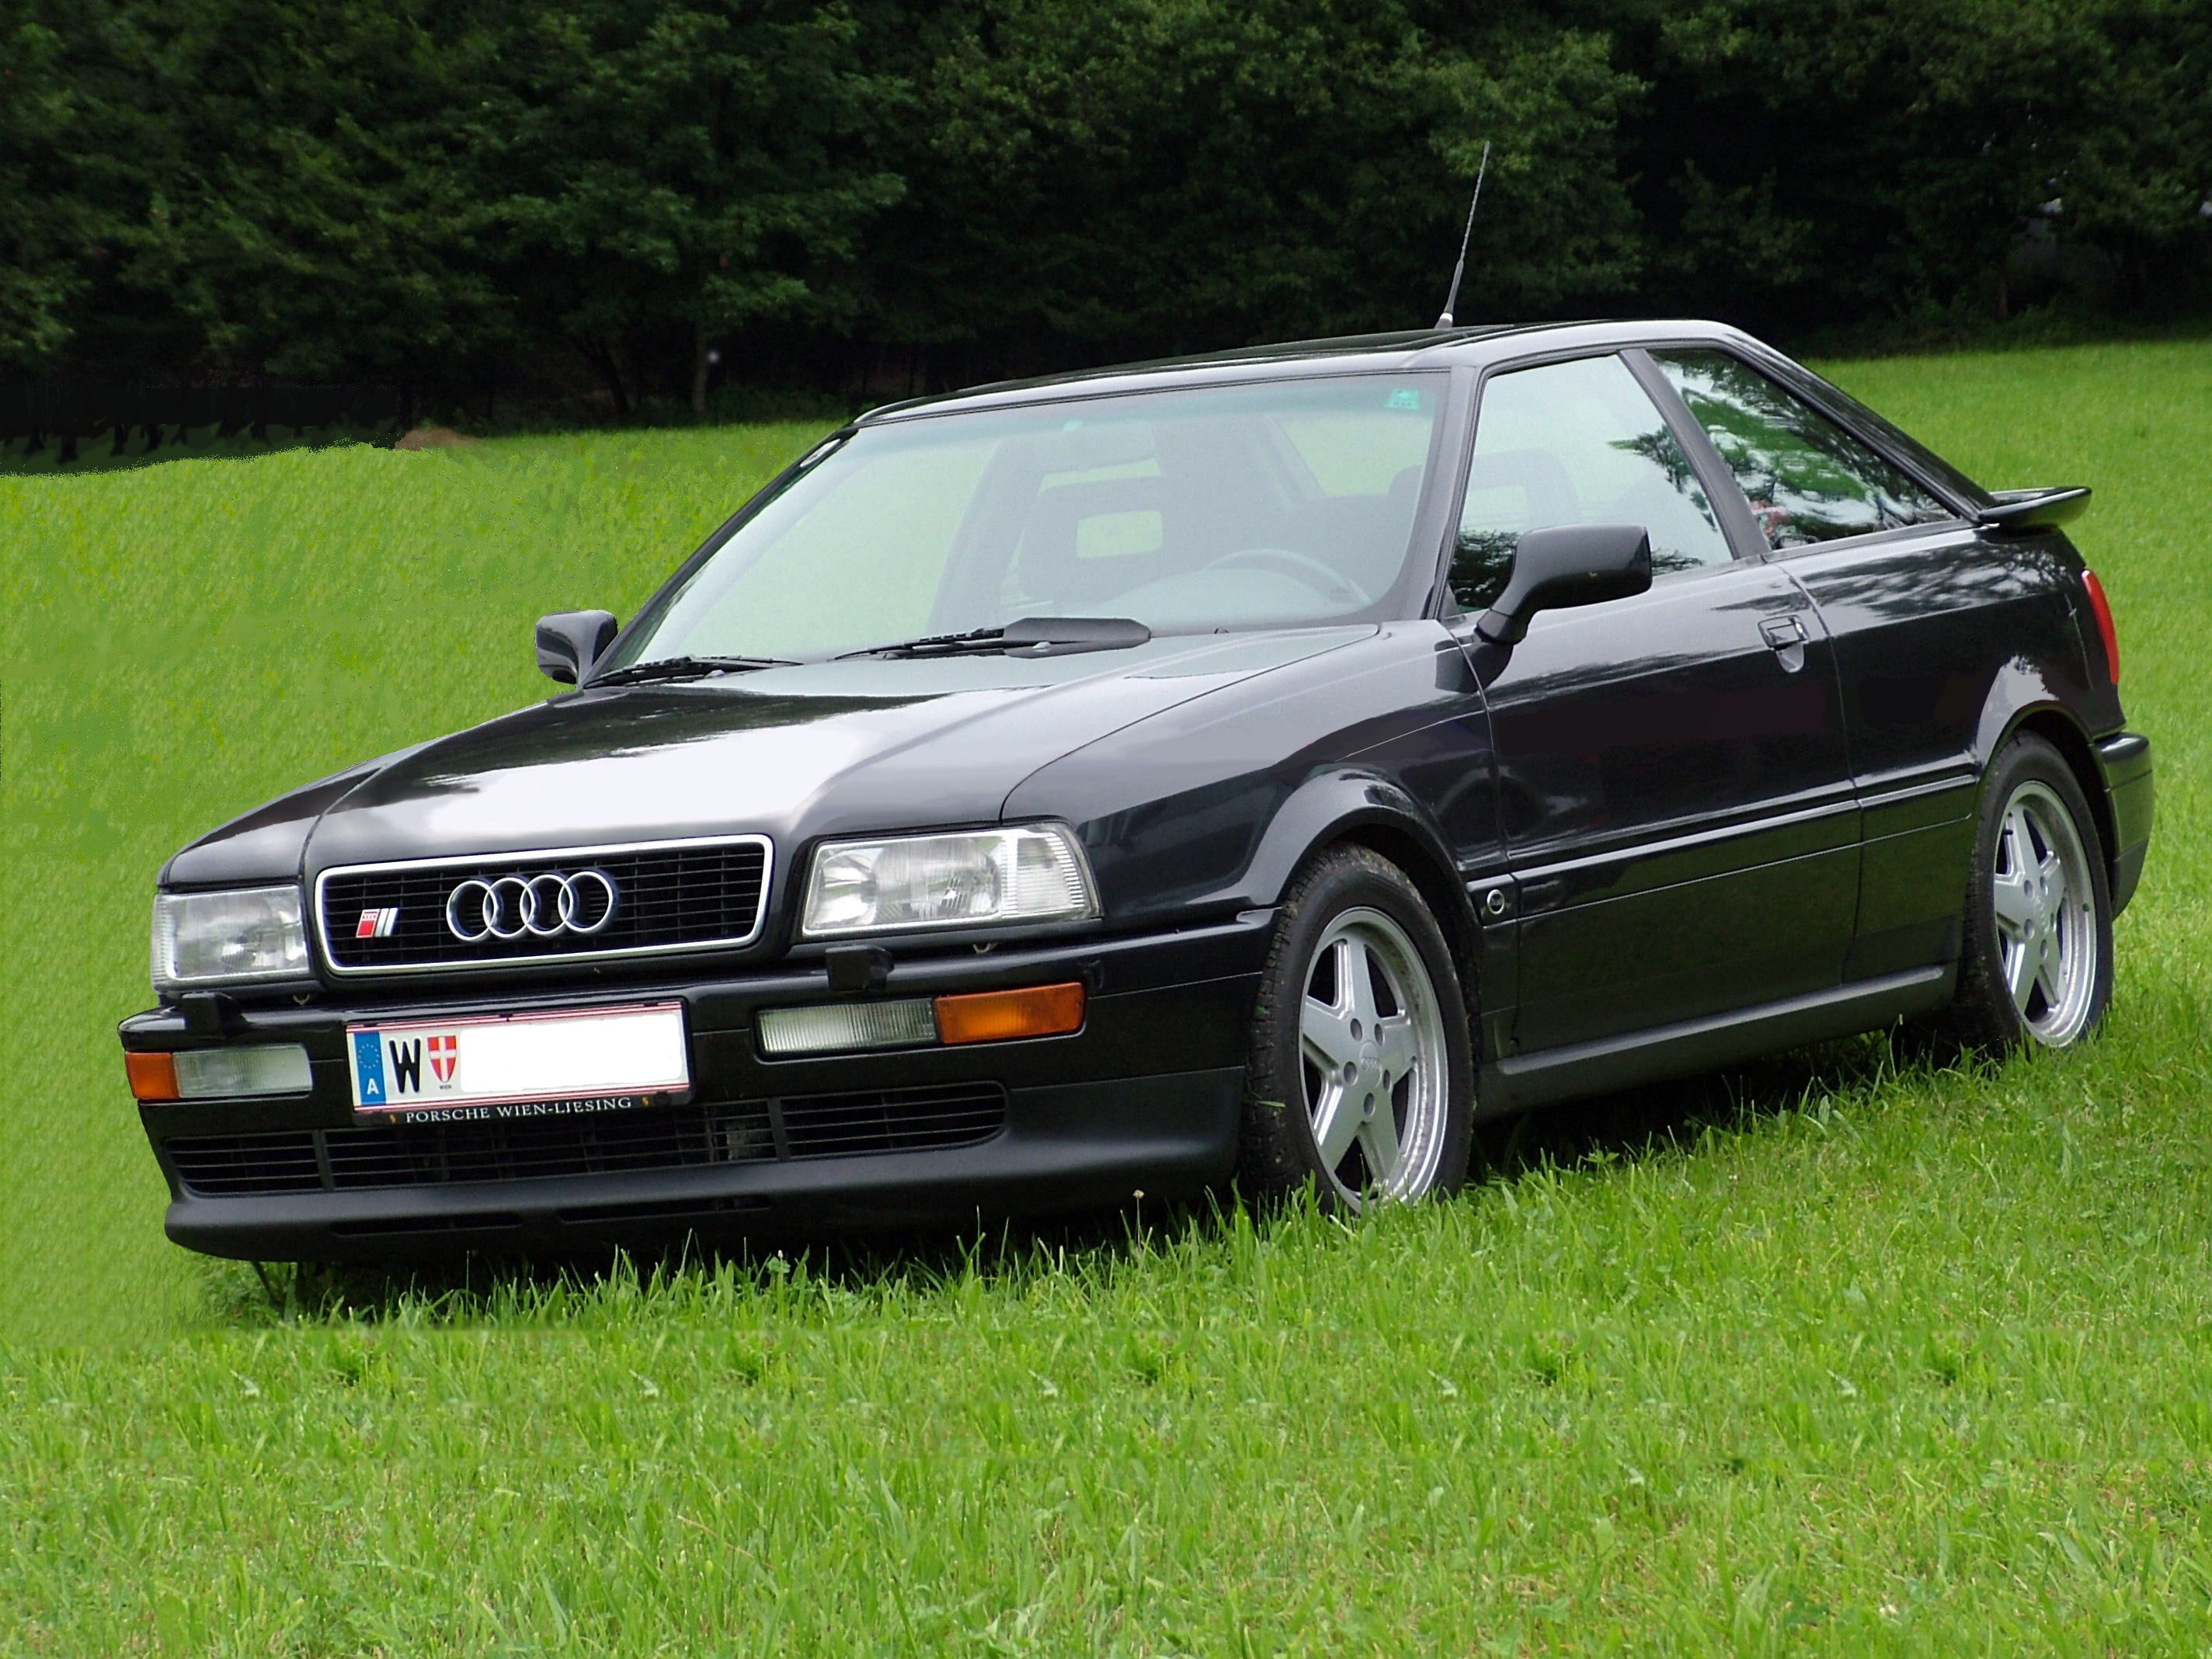 Audi S2 technical details, history, photos on Better Parts LTD  Audi S Builat on